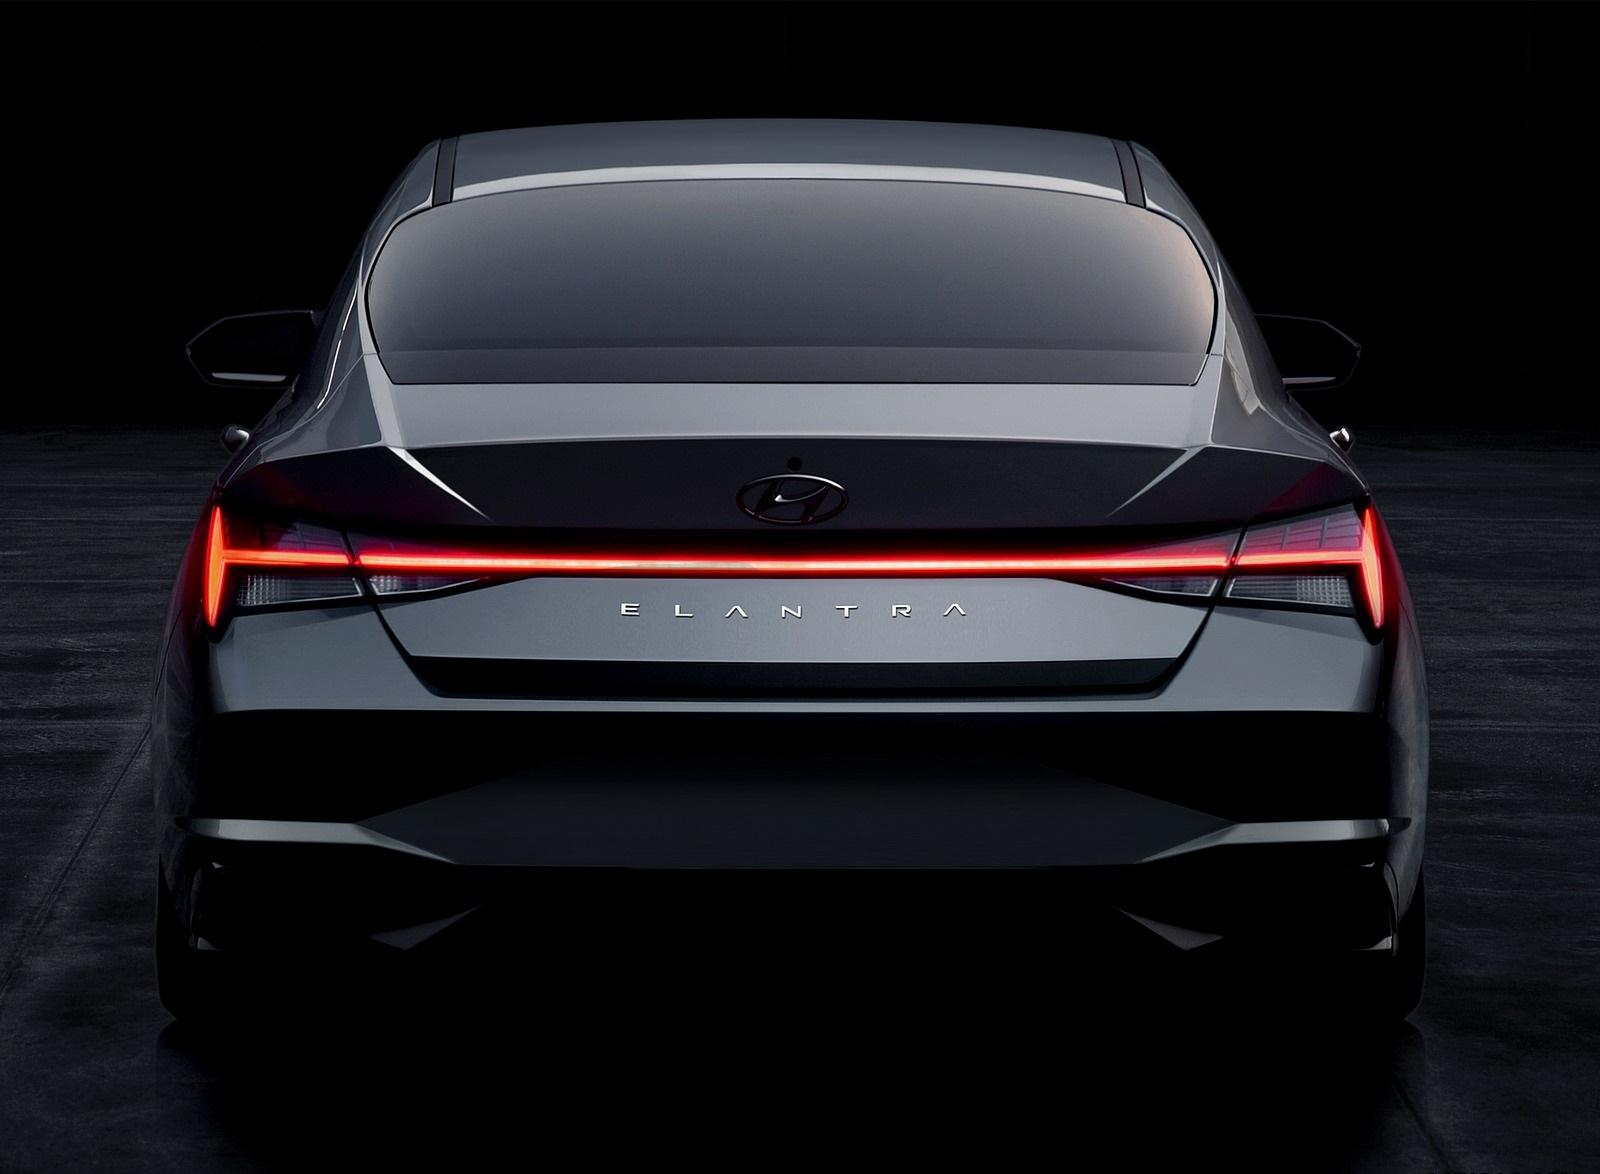 2021 Hyundai Elantra Rear Wallpapers (10)